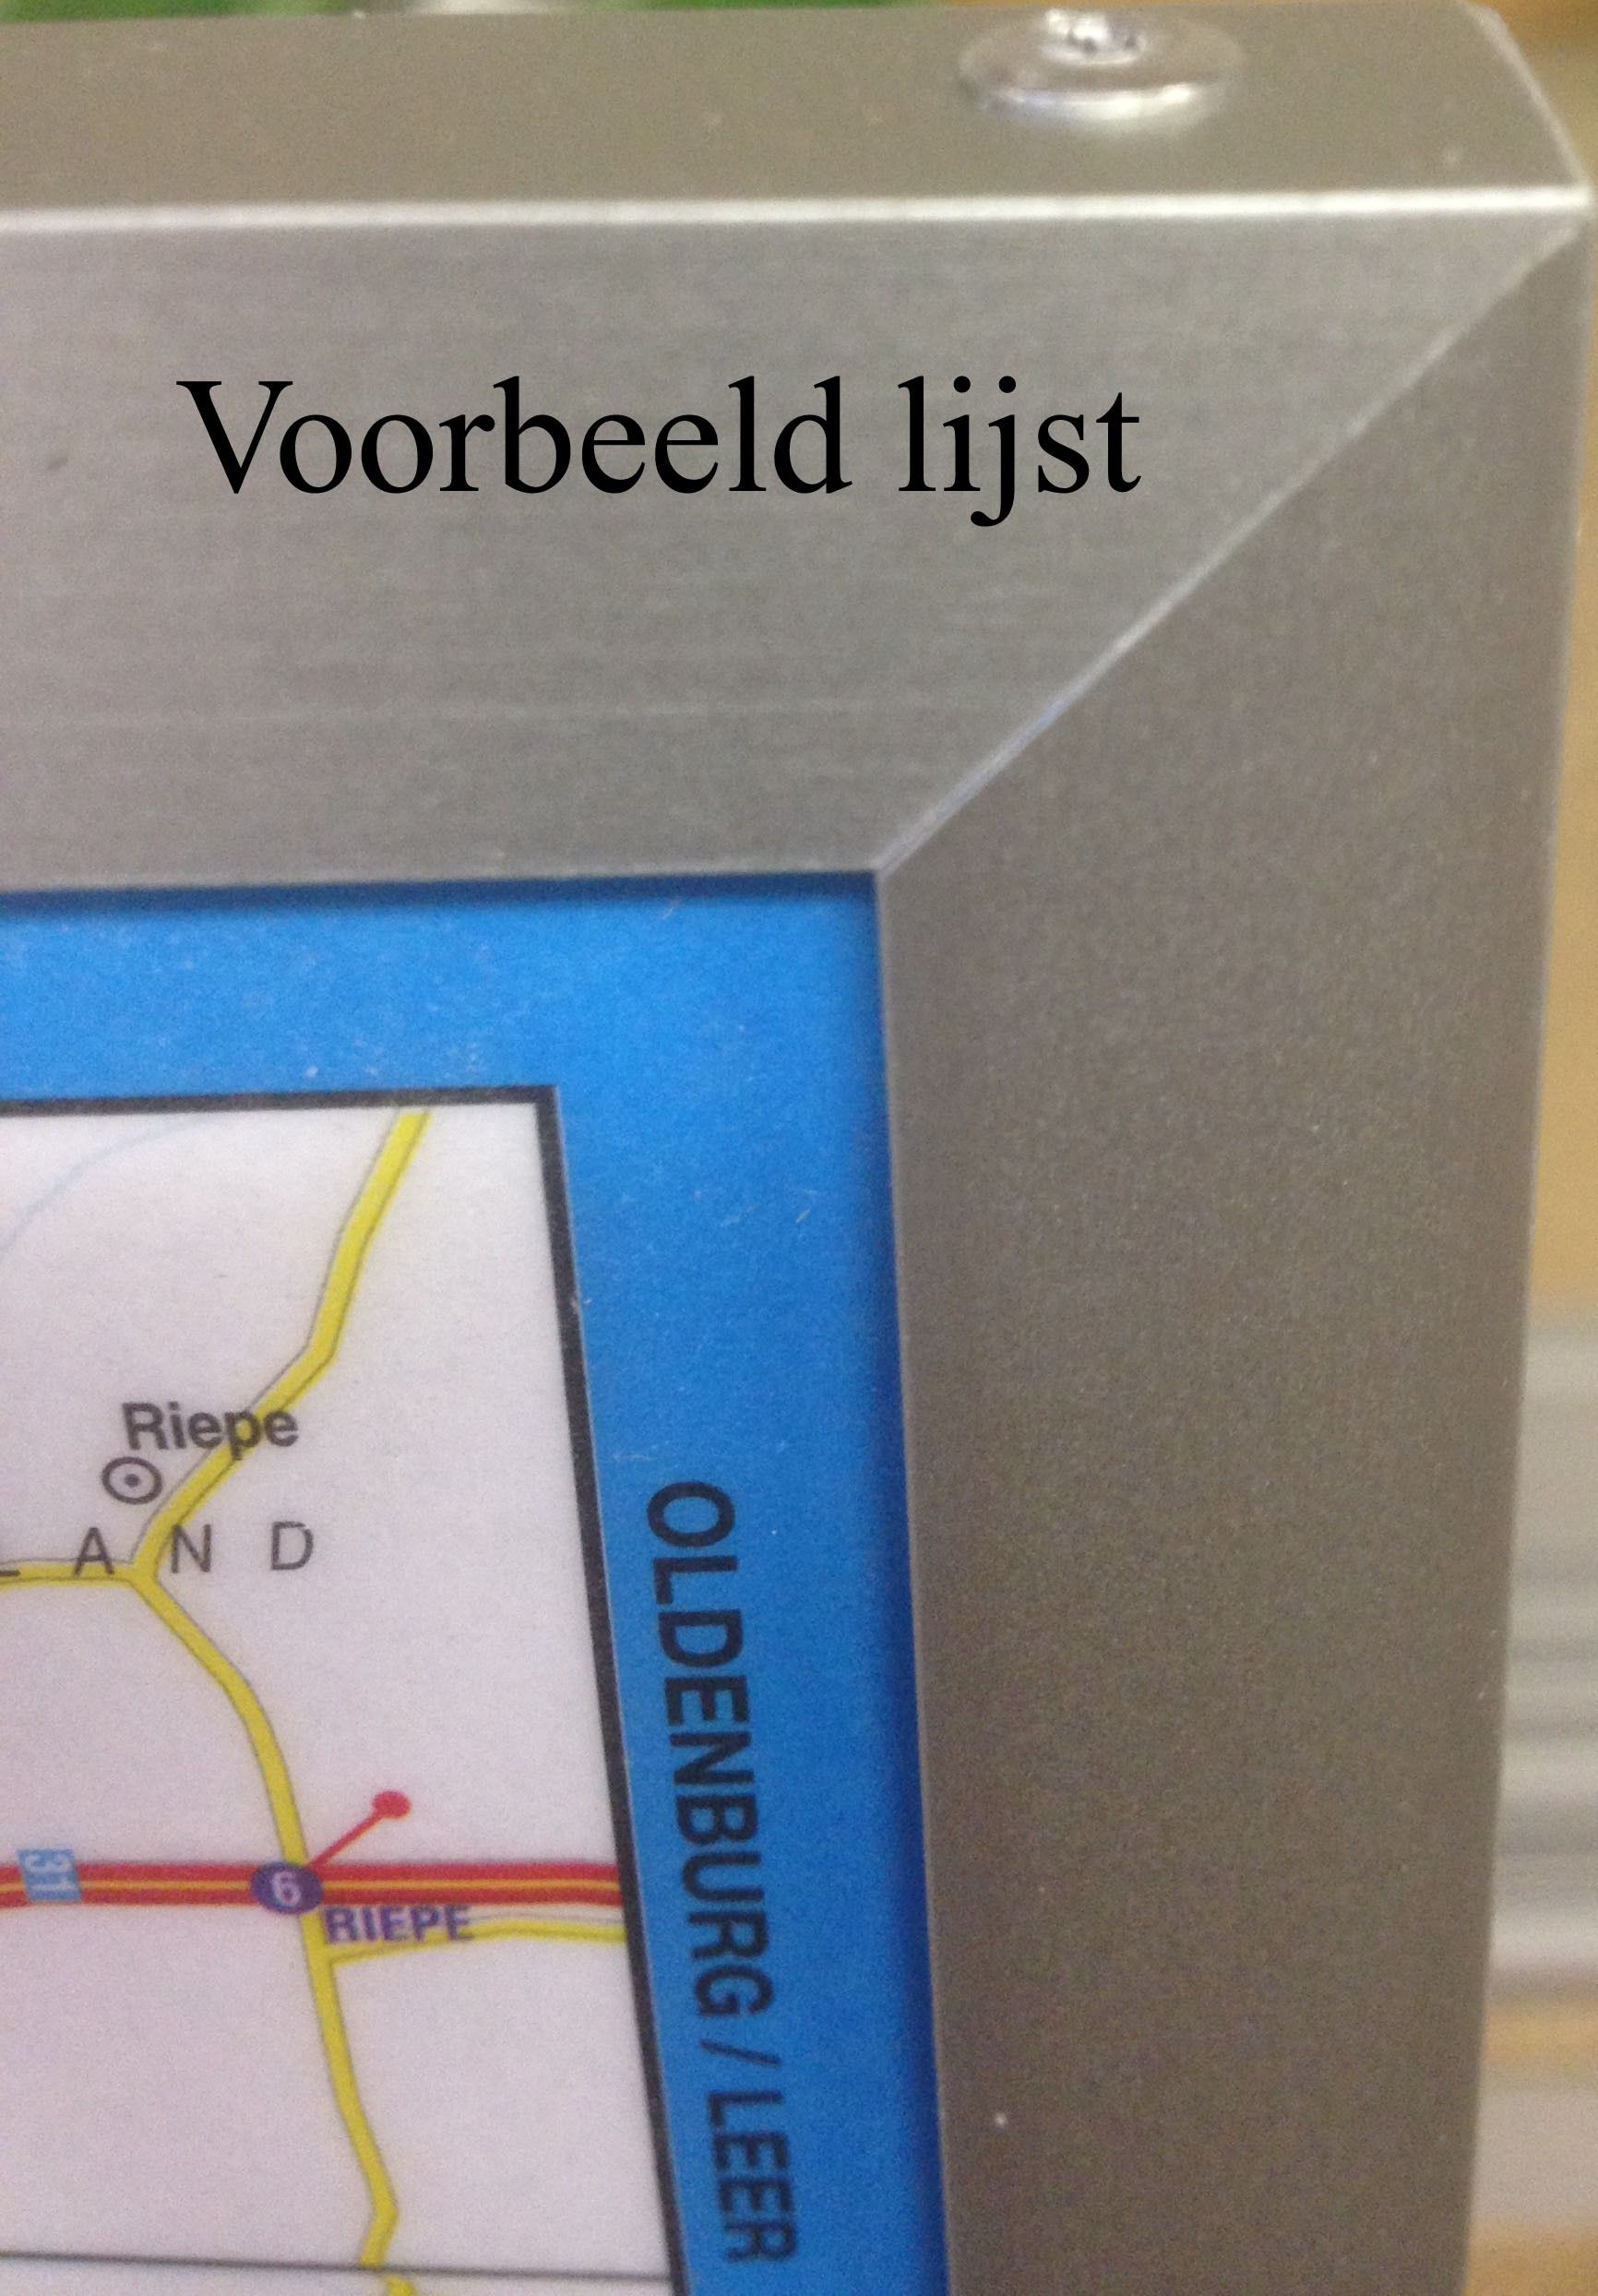 Provincie kaart Flevoland